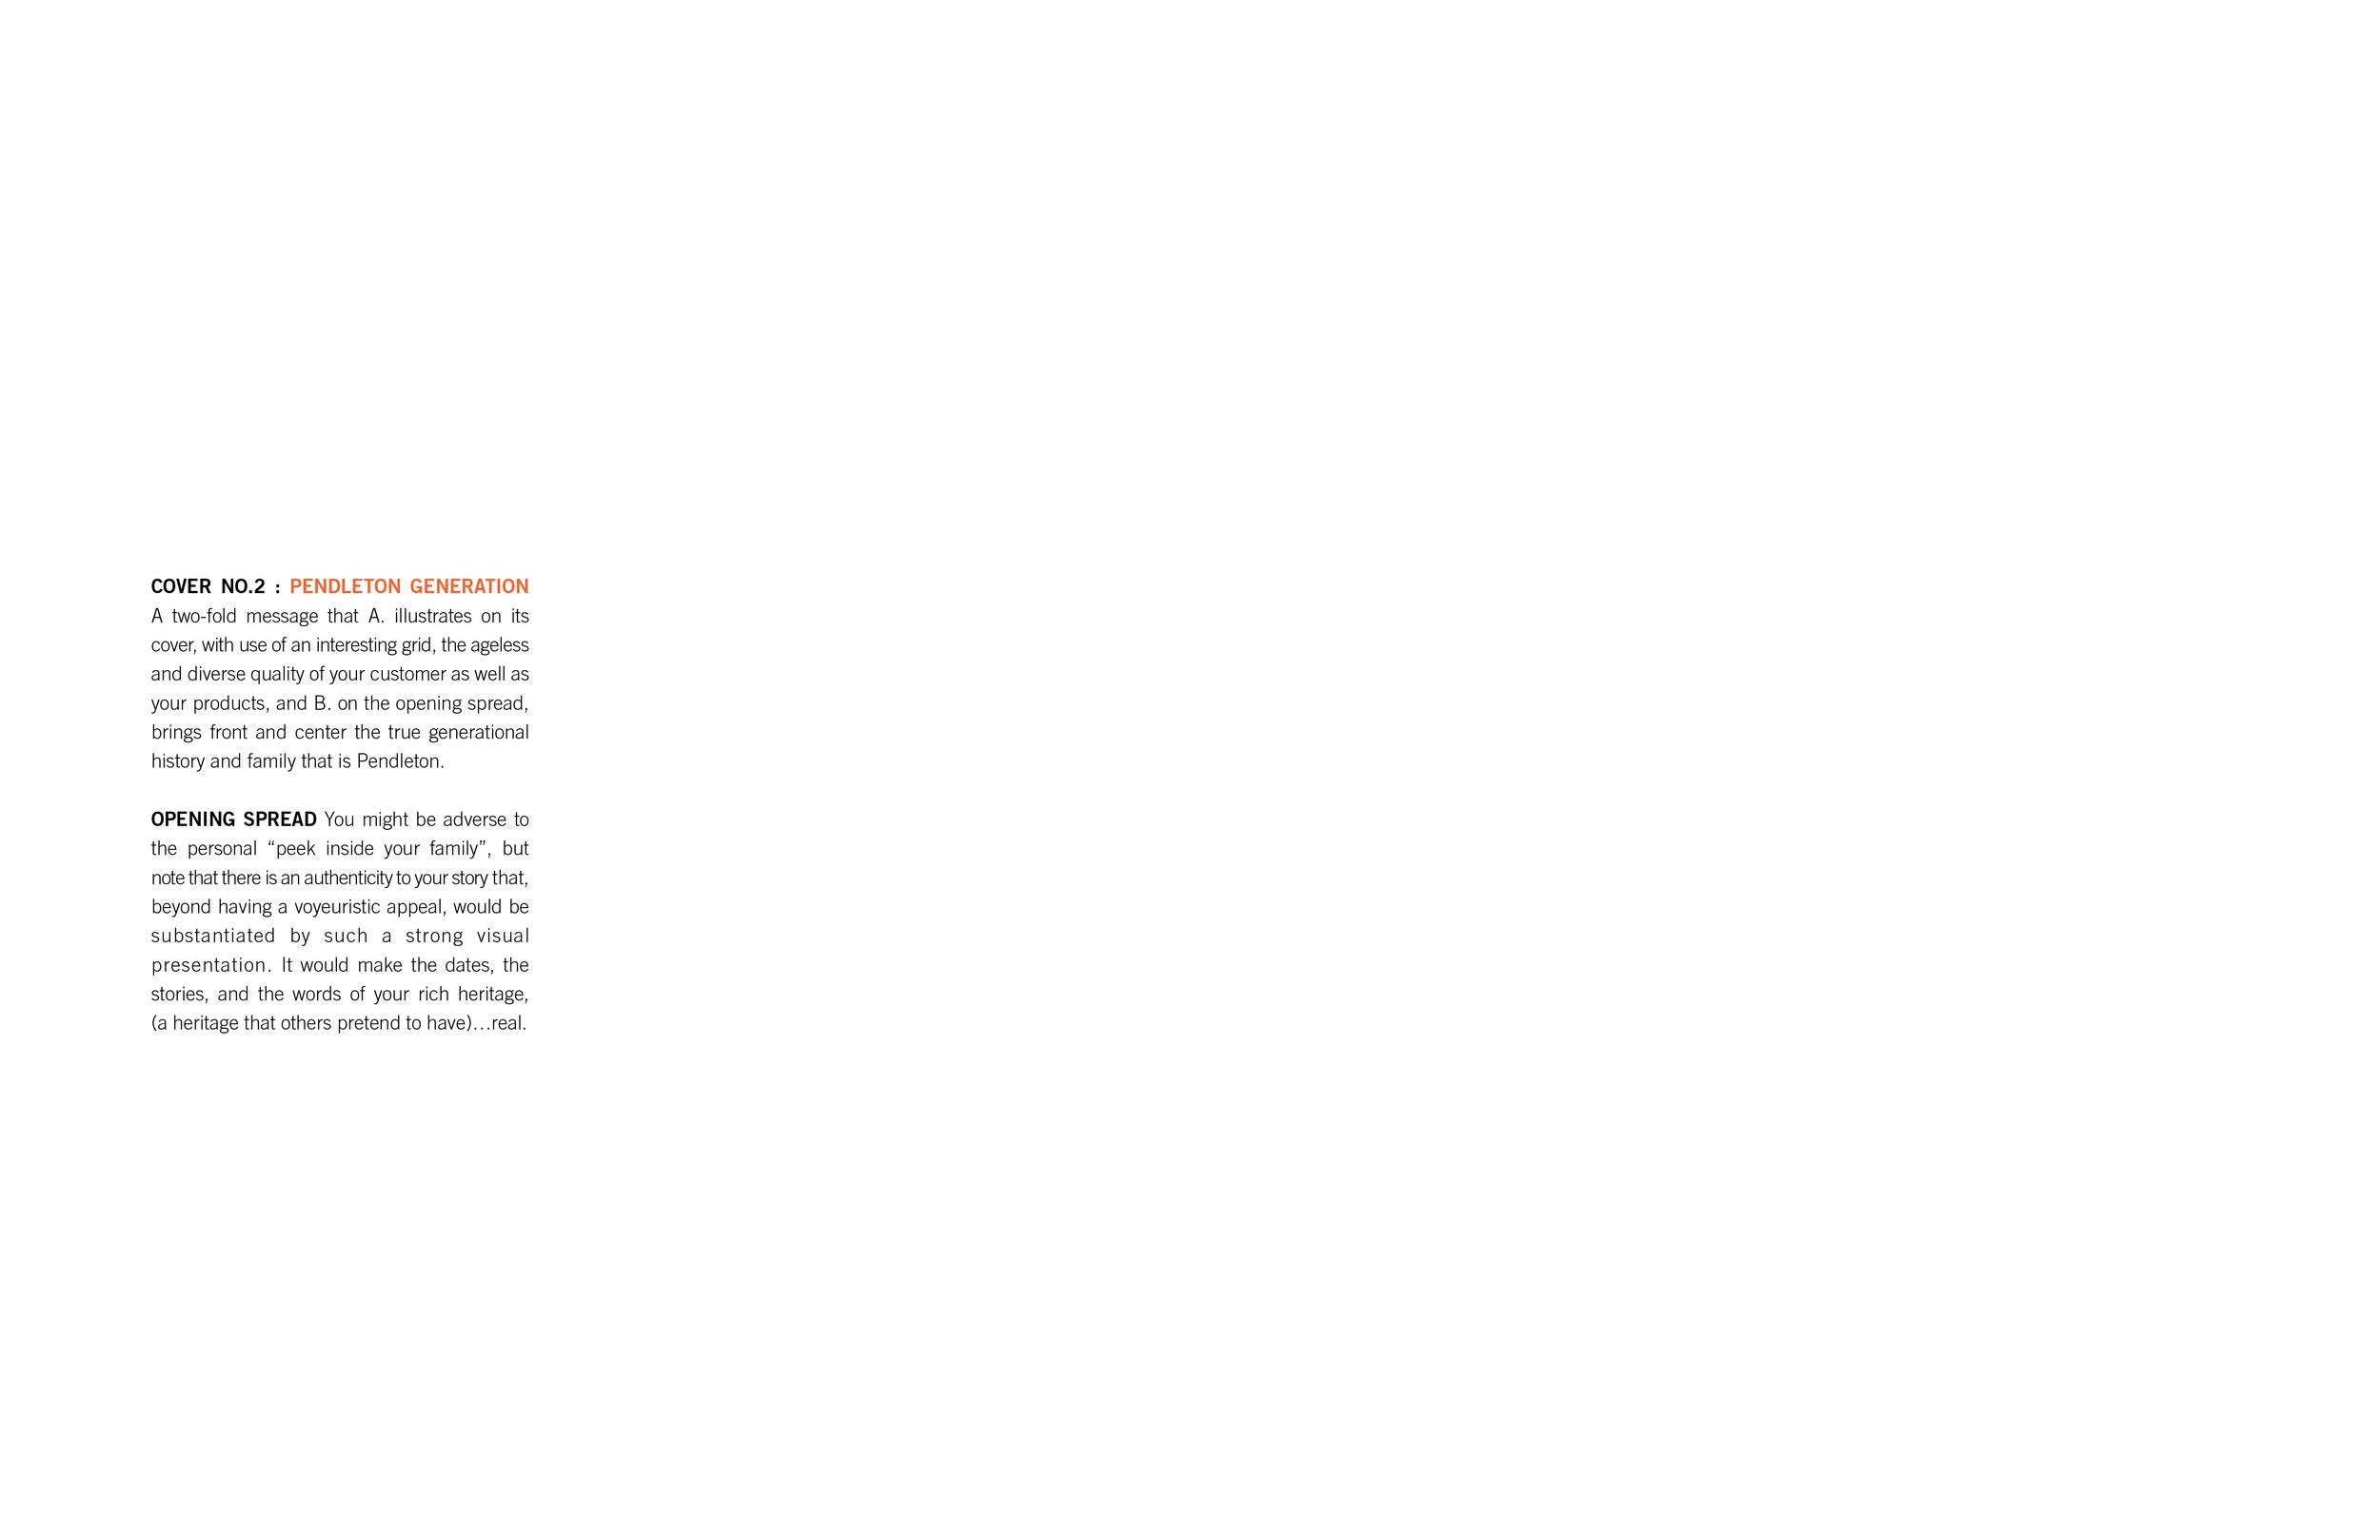 Pendleton Rationale 2016-6.jpg